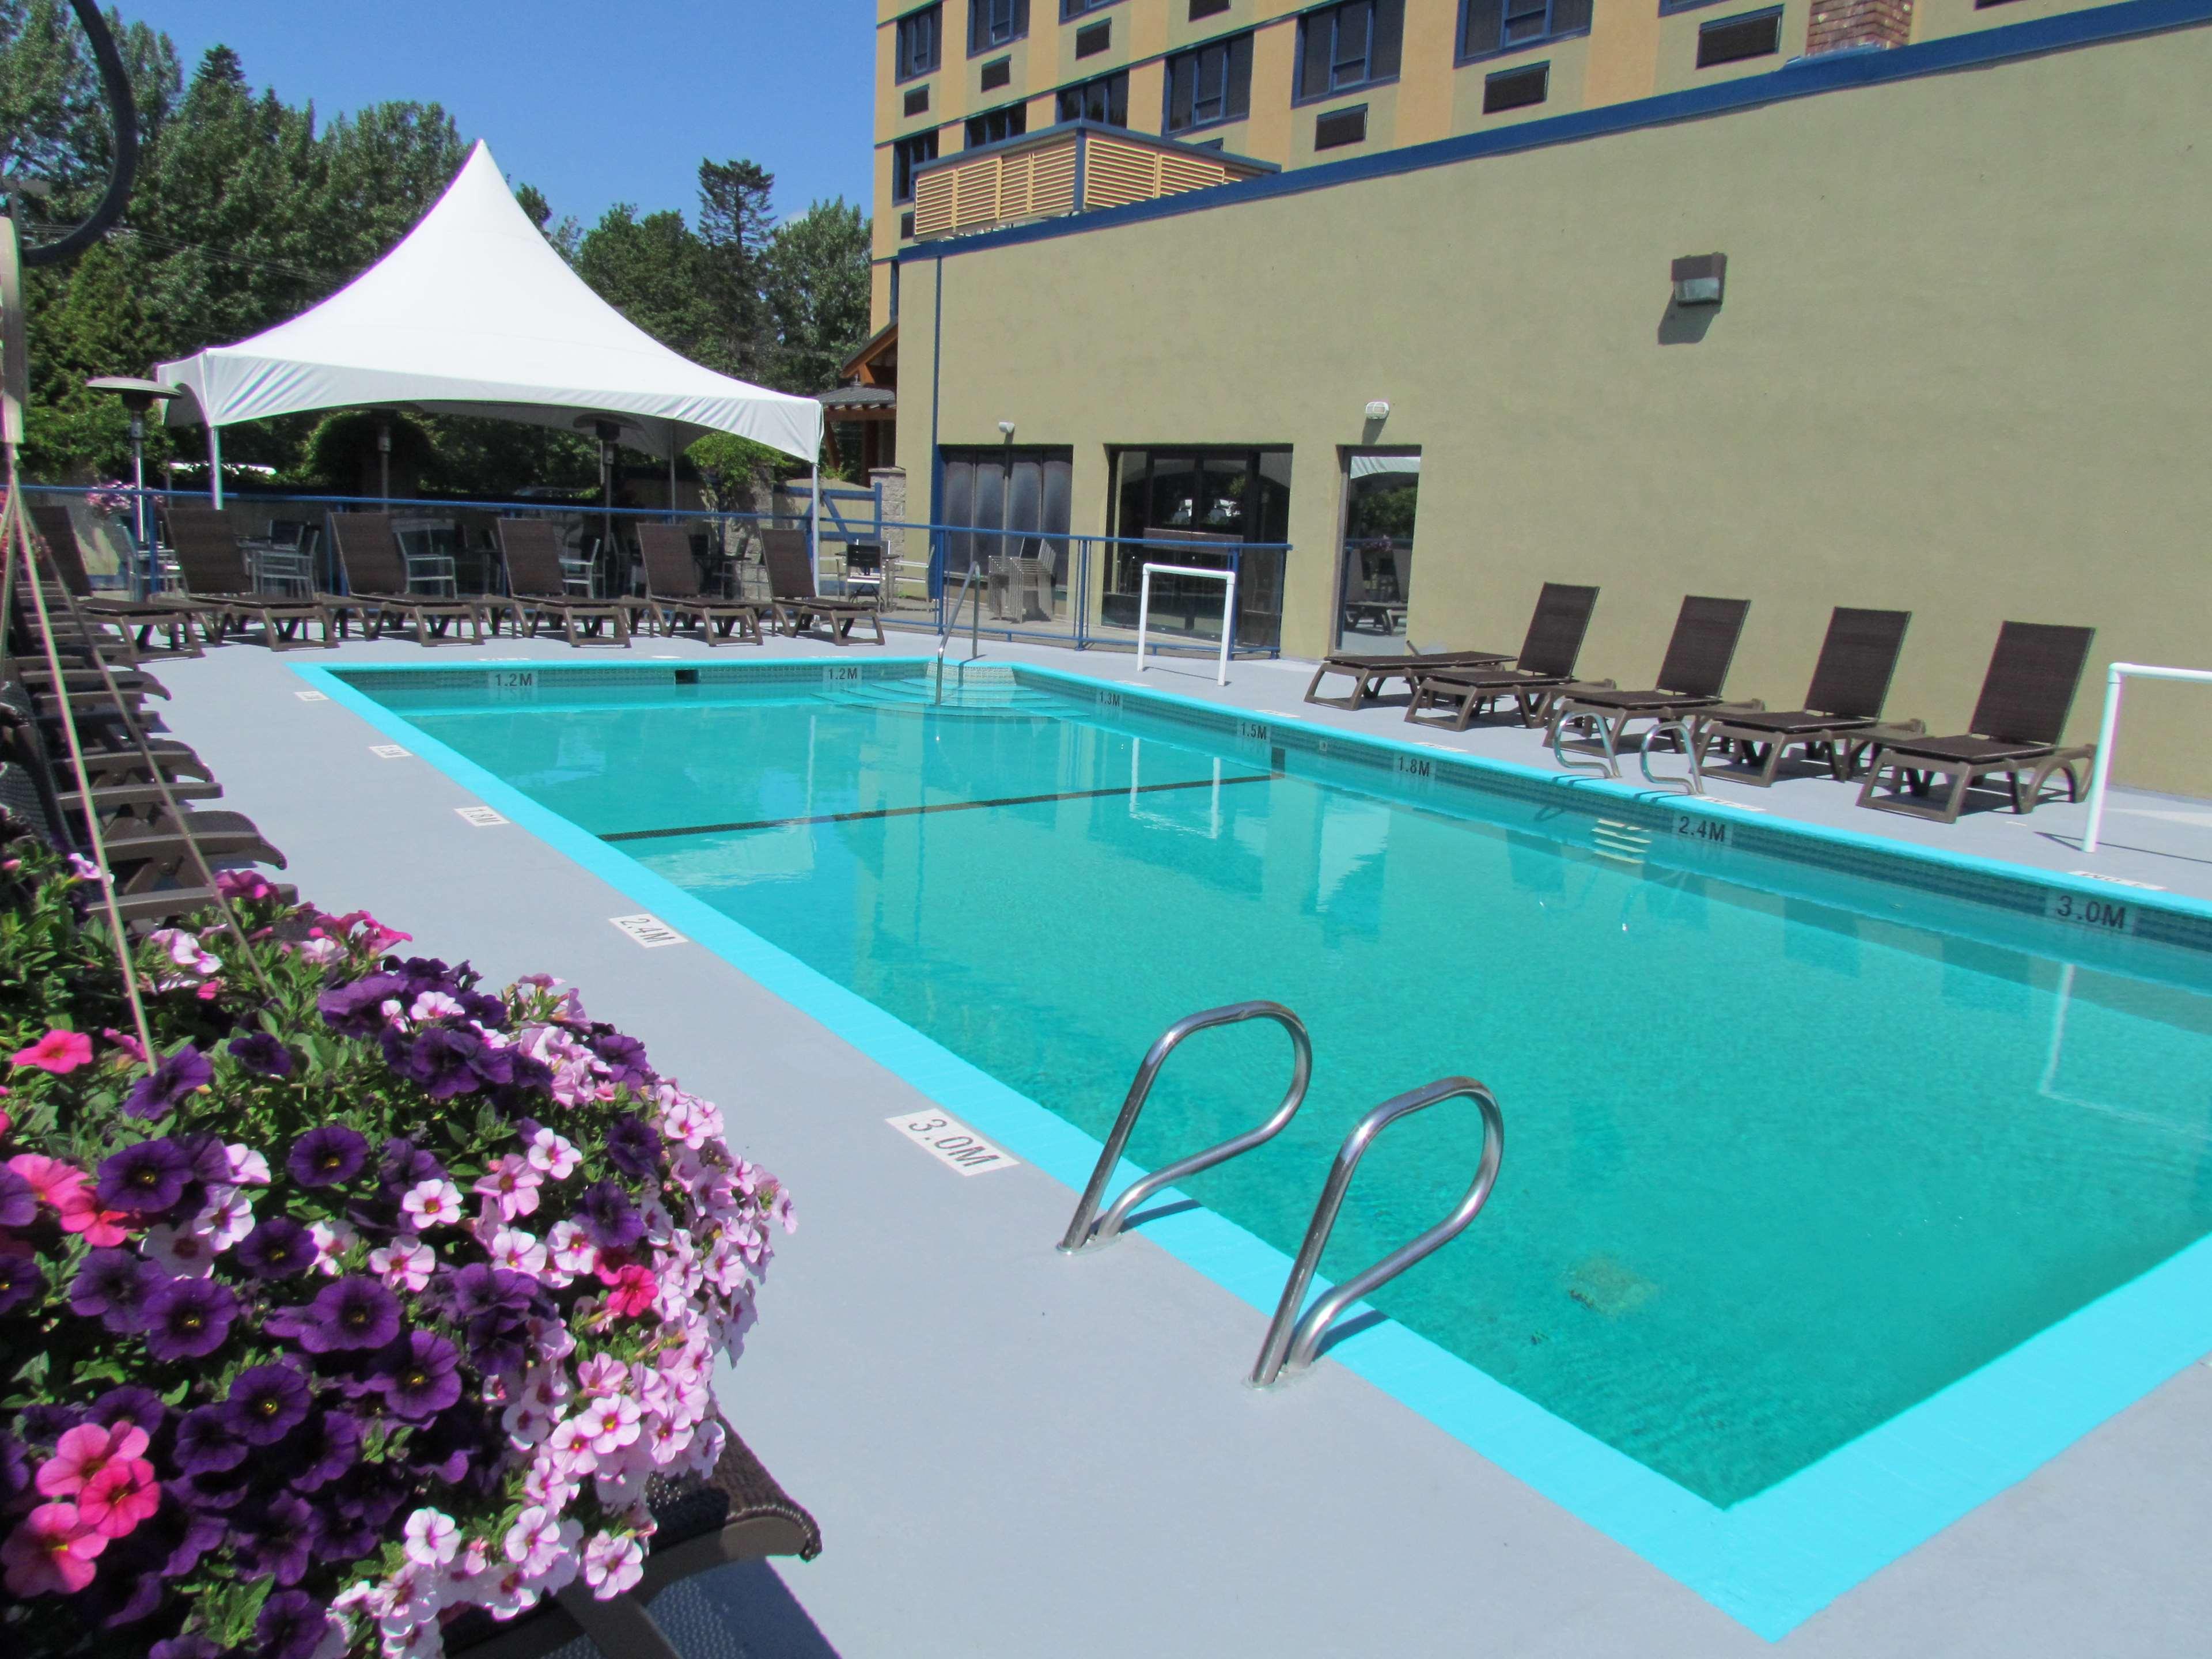 Best Western Plus Barclay Hotel in Port Alberni: Enjoy our heated outdoor pool.